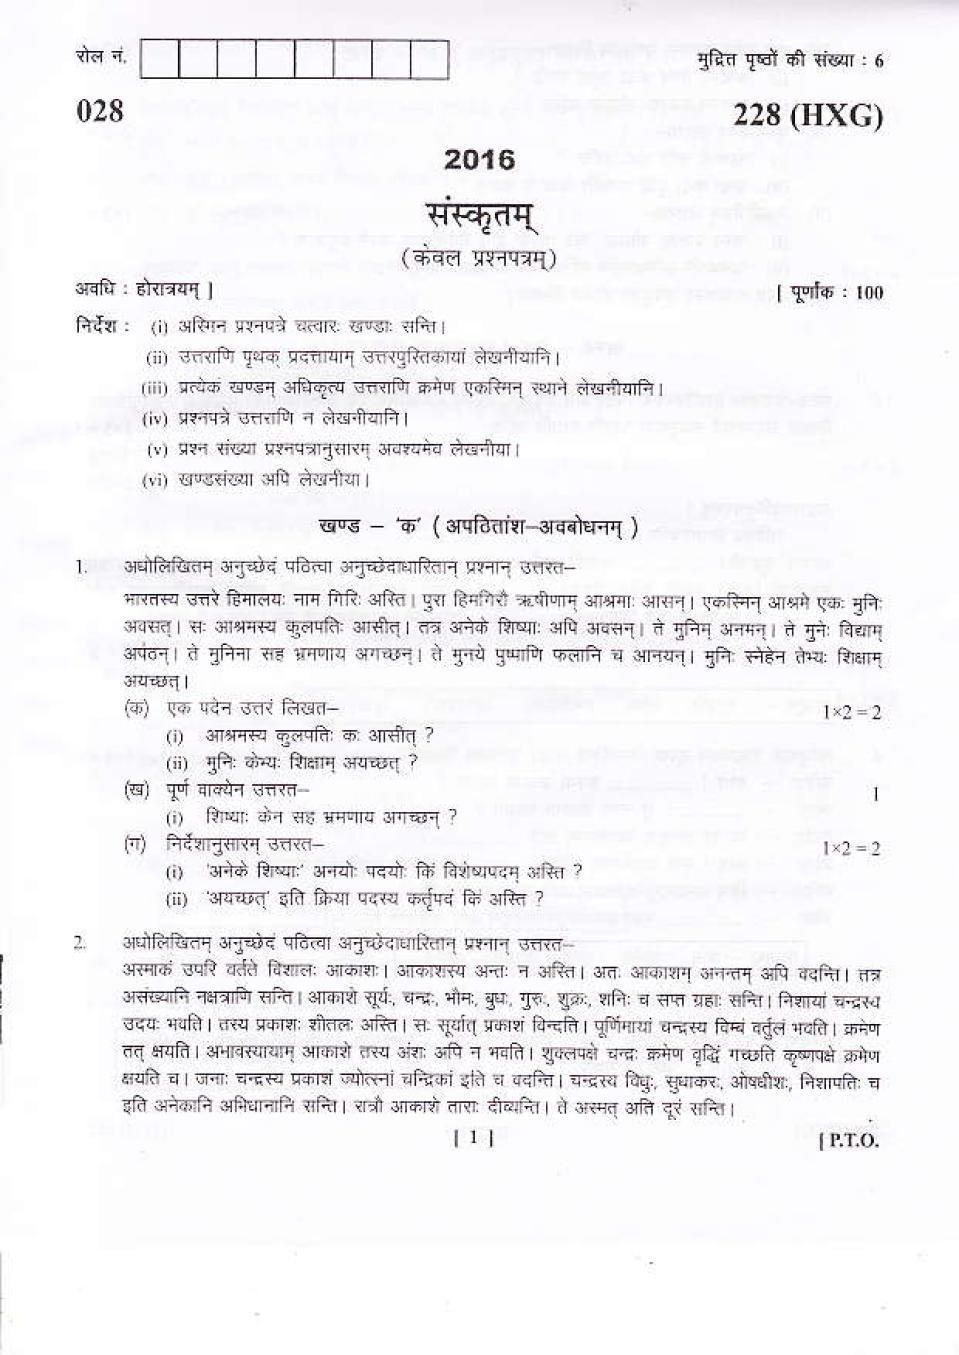 Uttarakhand Board Class 10 Question Paper 2016 for Sanskrit - Page 1